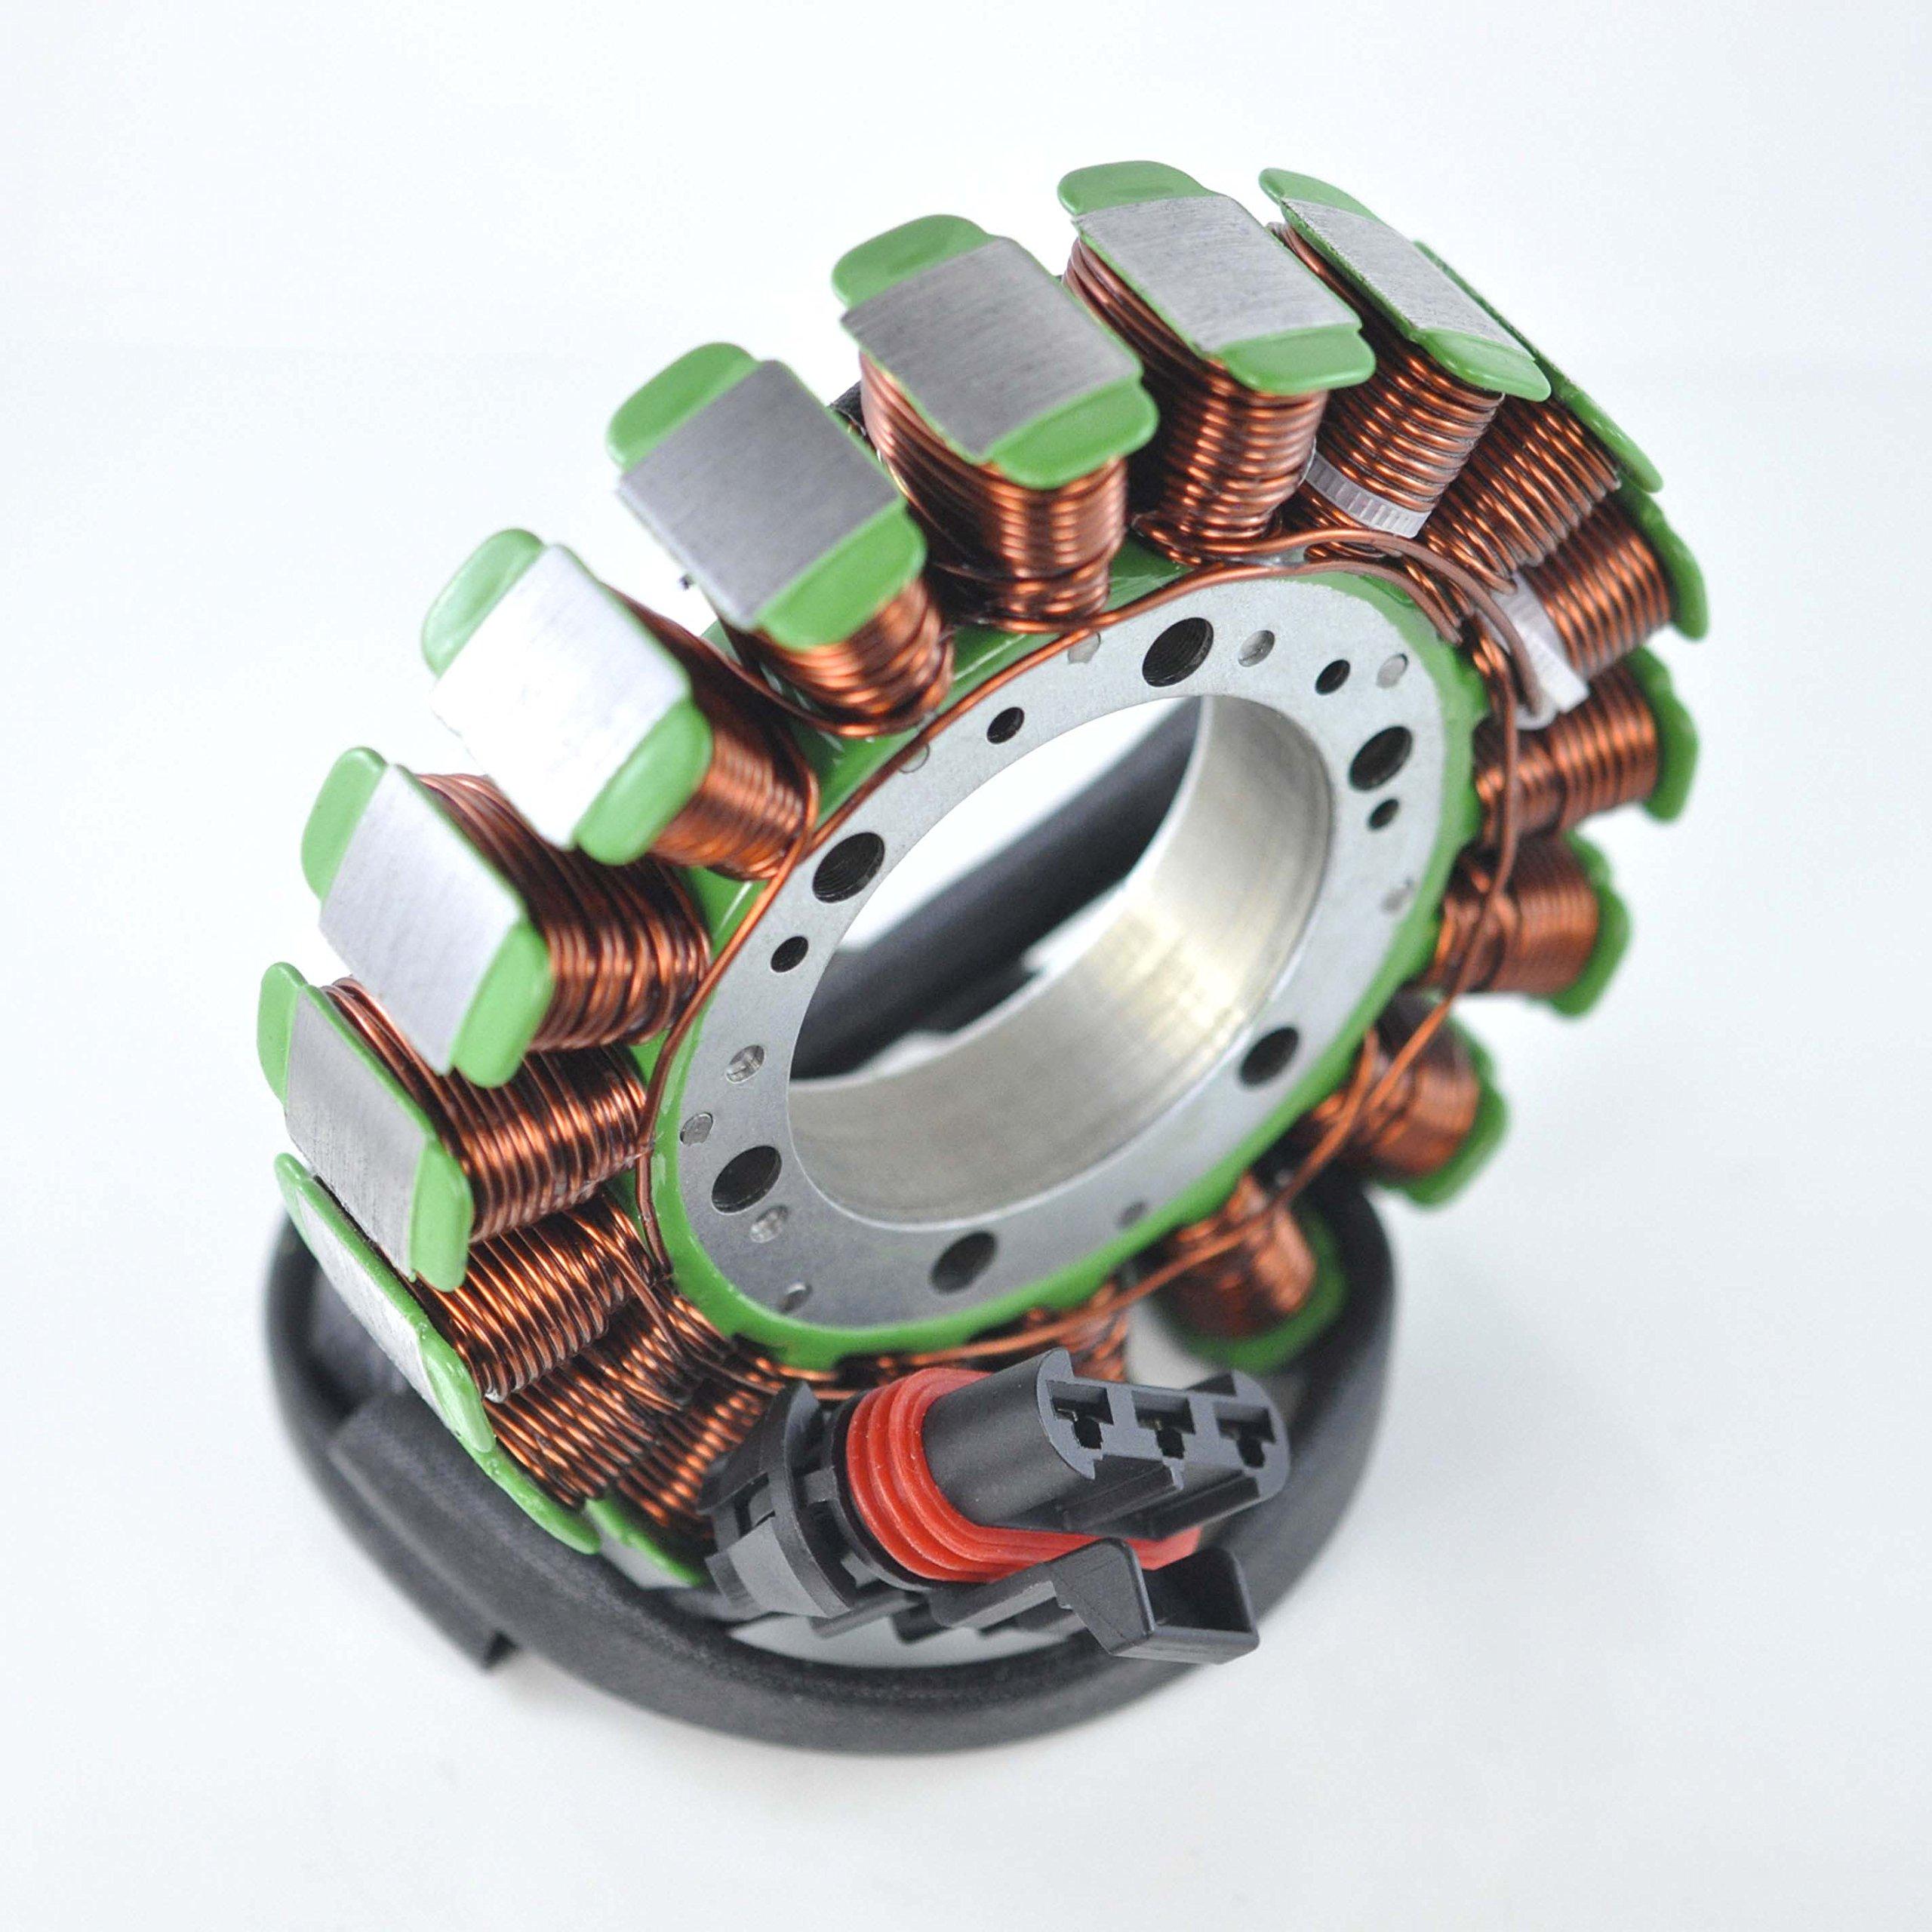 Generator Stator For Polaris Ranger Crew XP RZR S 4 Sportsman HO ETX SP X2 Scrambler General ACE 450 500 570 850 900 1000 2012-2019 Rep# 4013970 4013990 4013013 4015292 4015340 4014839 4014406 4014402